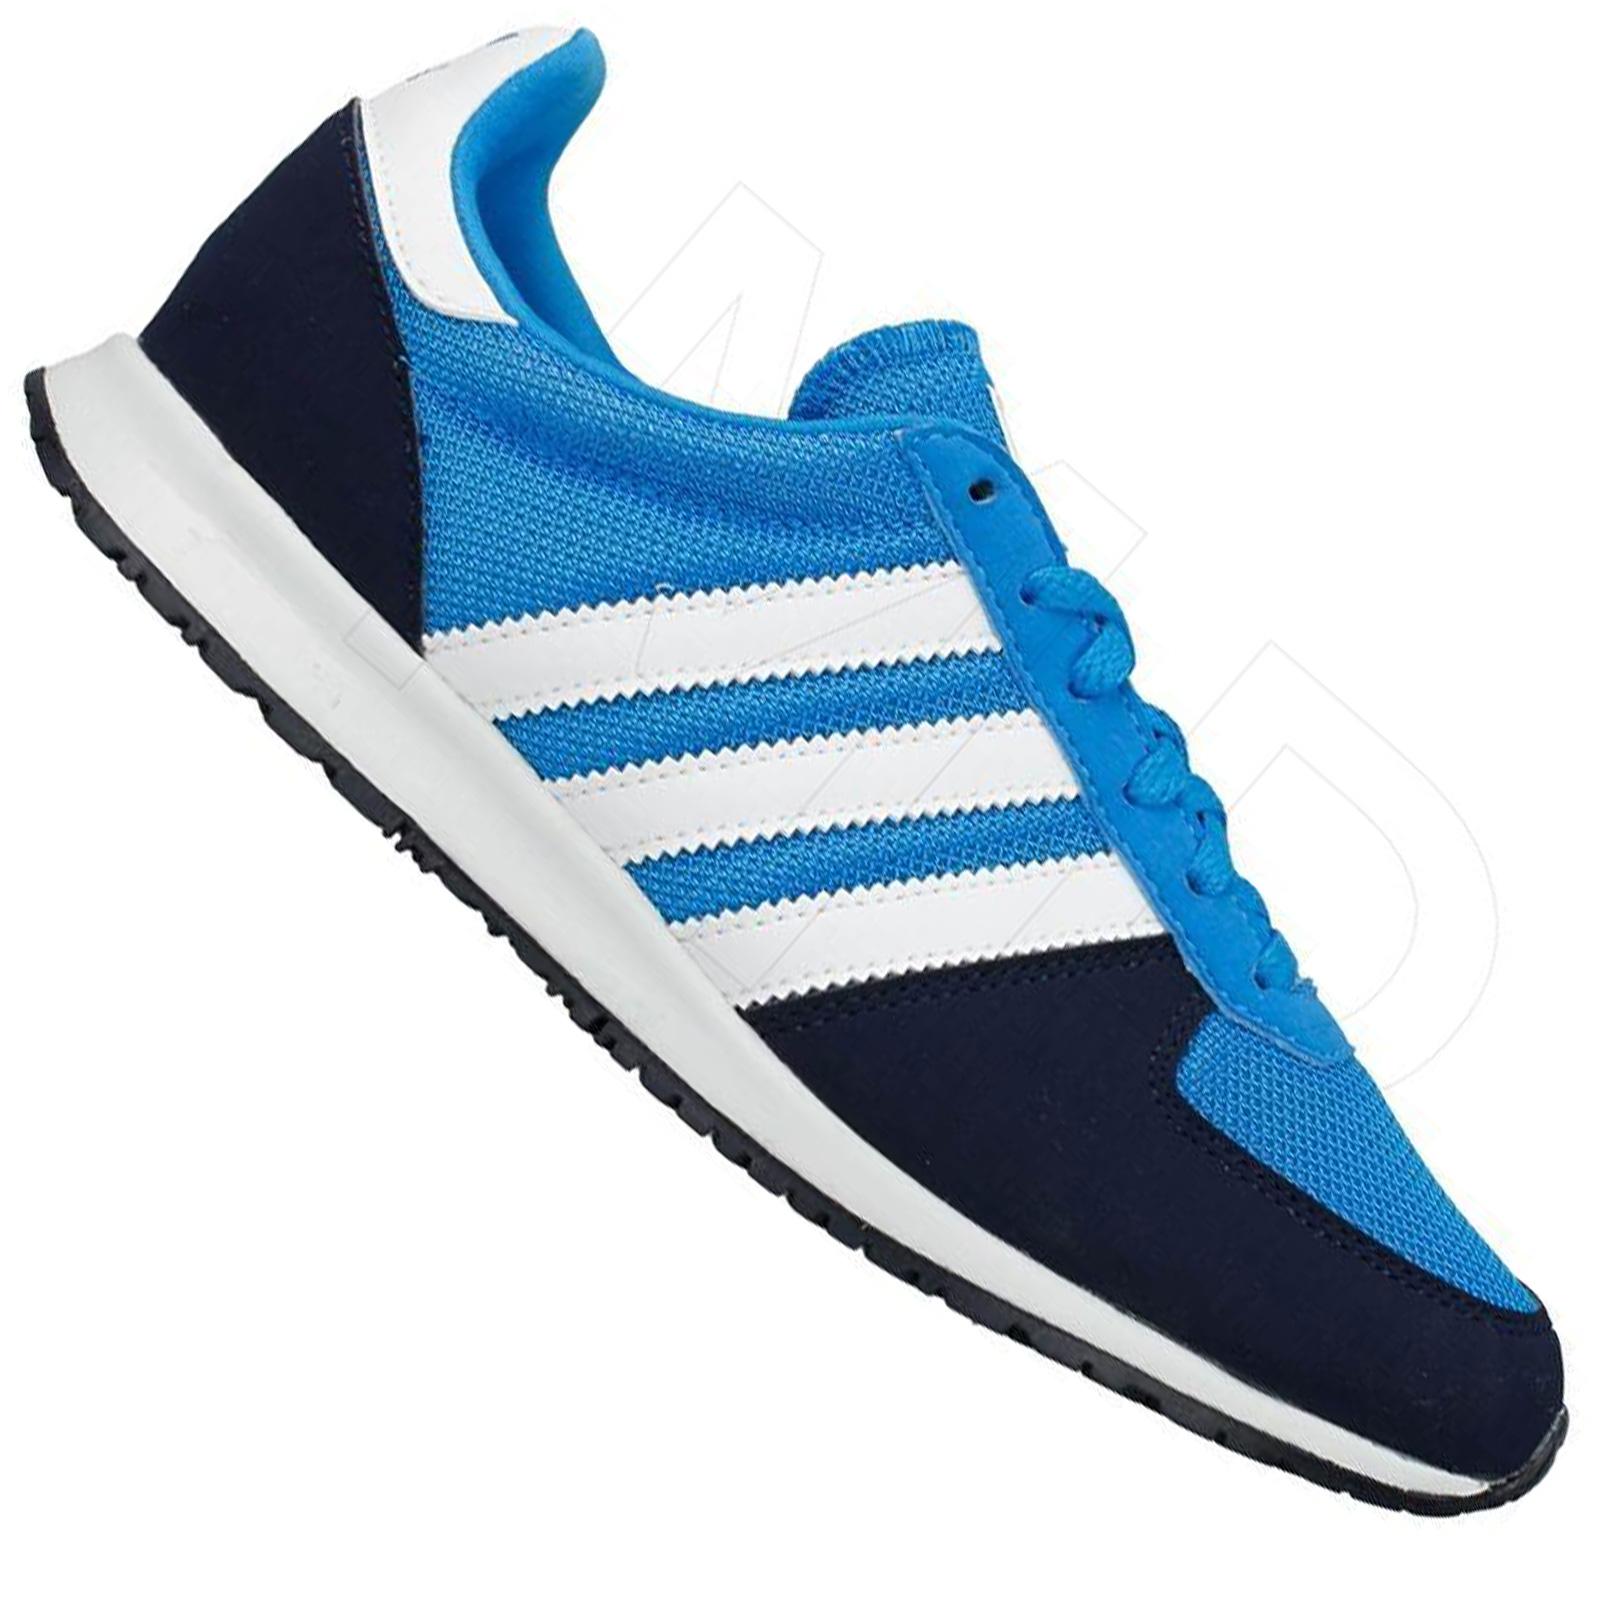 brand new 18e9b 8e52c adidas Originals Adistar Racer Damen Freizeit Schuhe Sneaker Dragon M17108  Blau